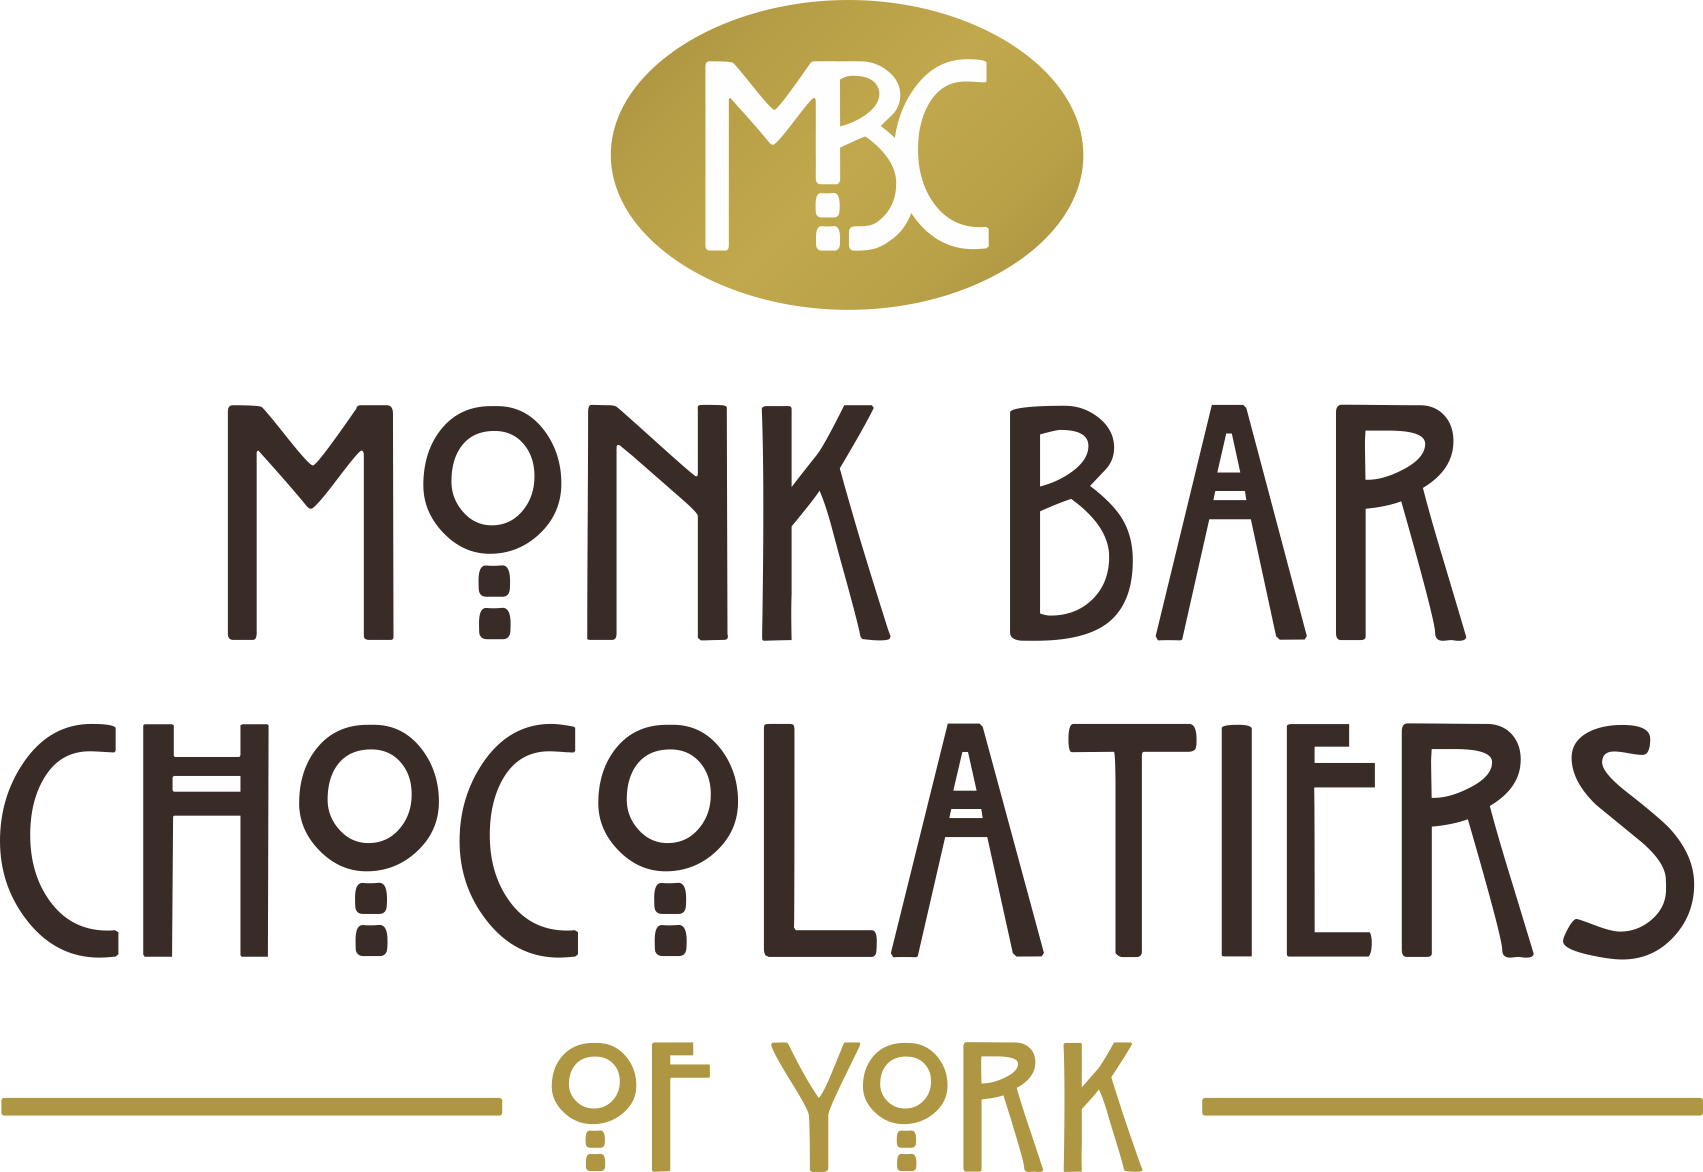 https://nestlerowntreerufc.co.uk/wp-content/uploads/2020/06/mbc-logo-Colour.png